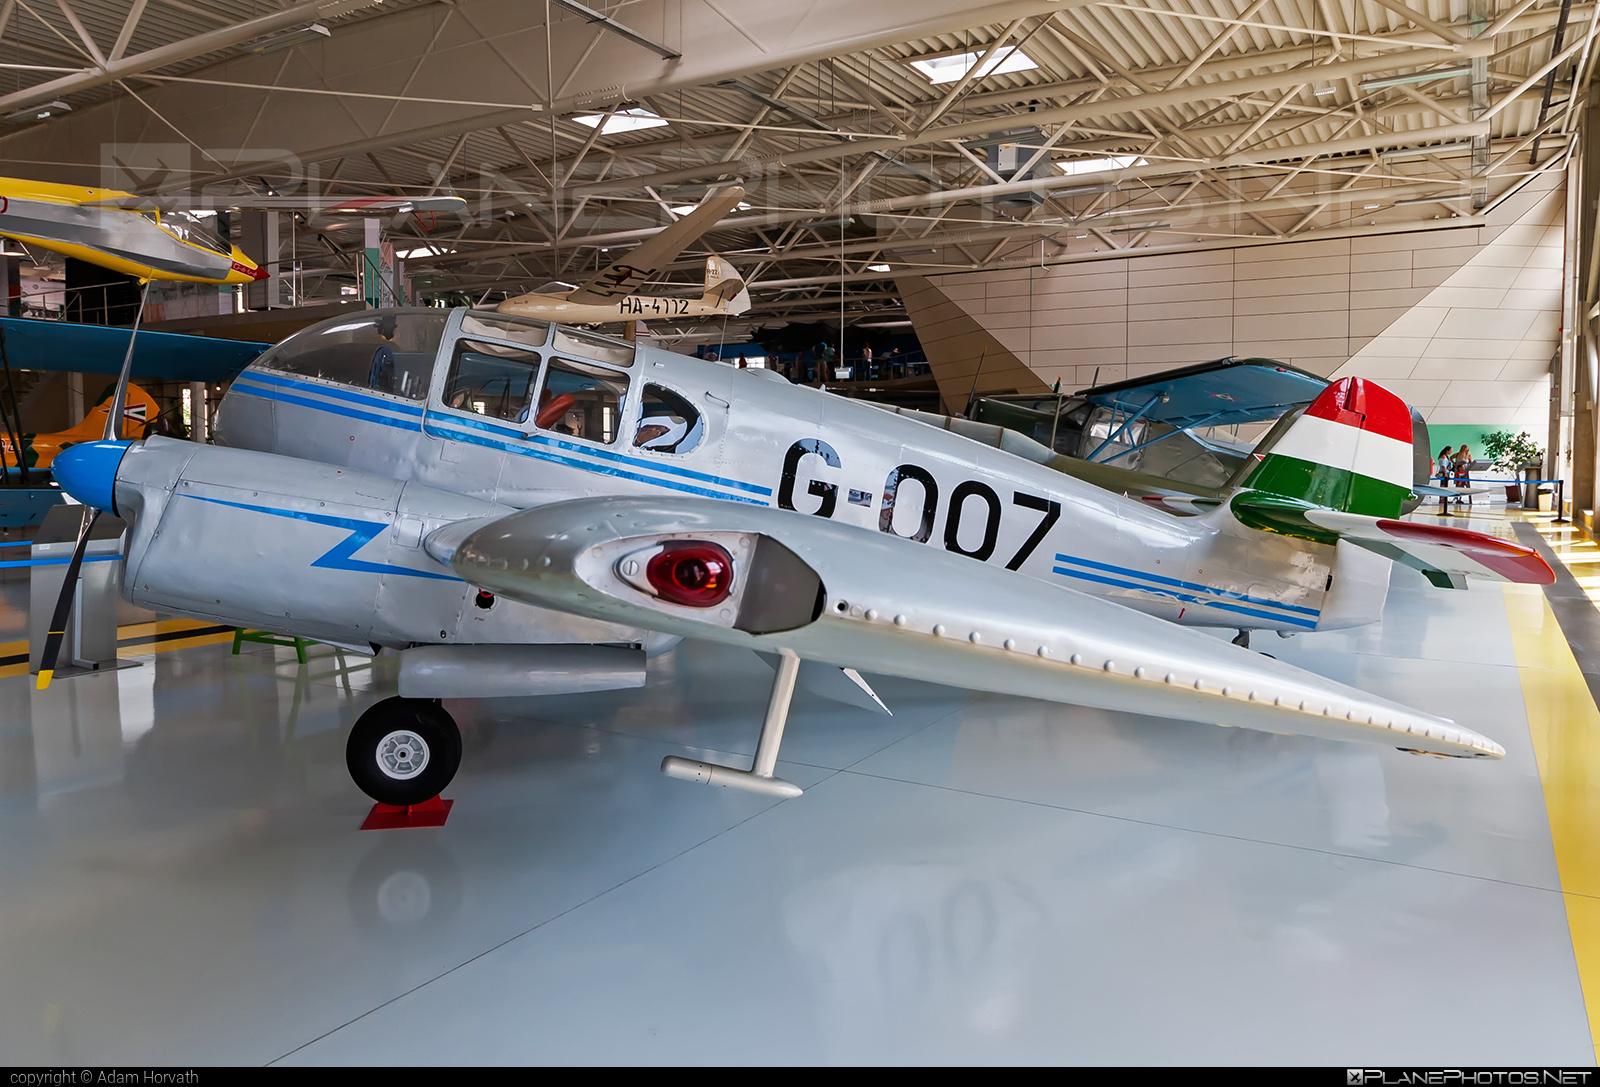 Aero Ae-45S Super - G-007 operated by Magyar Néphadsereg (Hungarian People's Army) #aero #hungarianpeoplesarmy #magyarnephadsereg